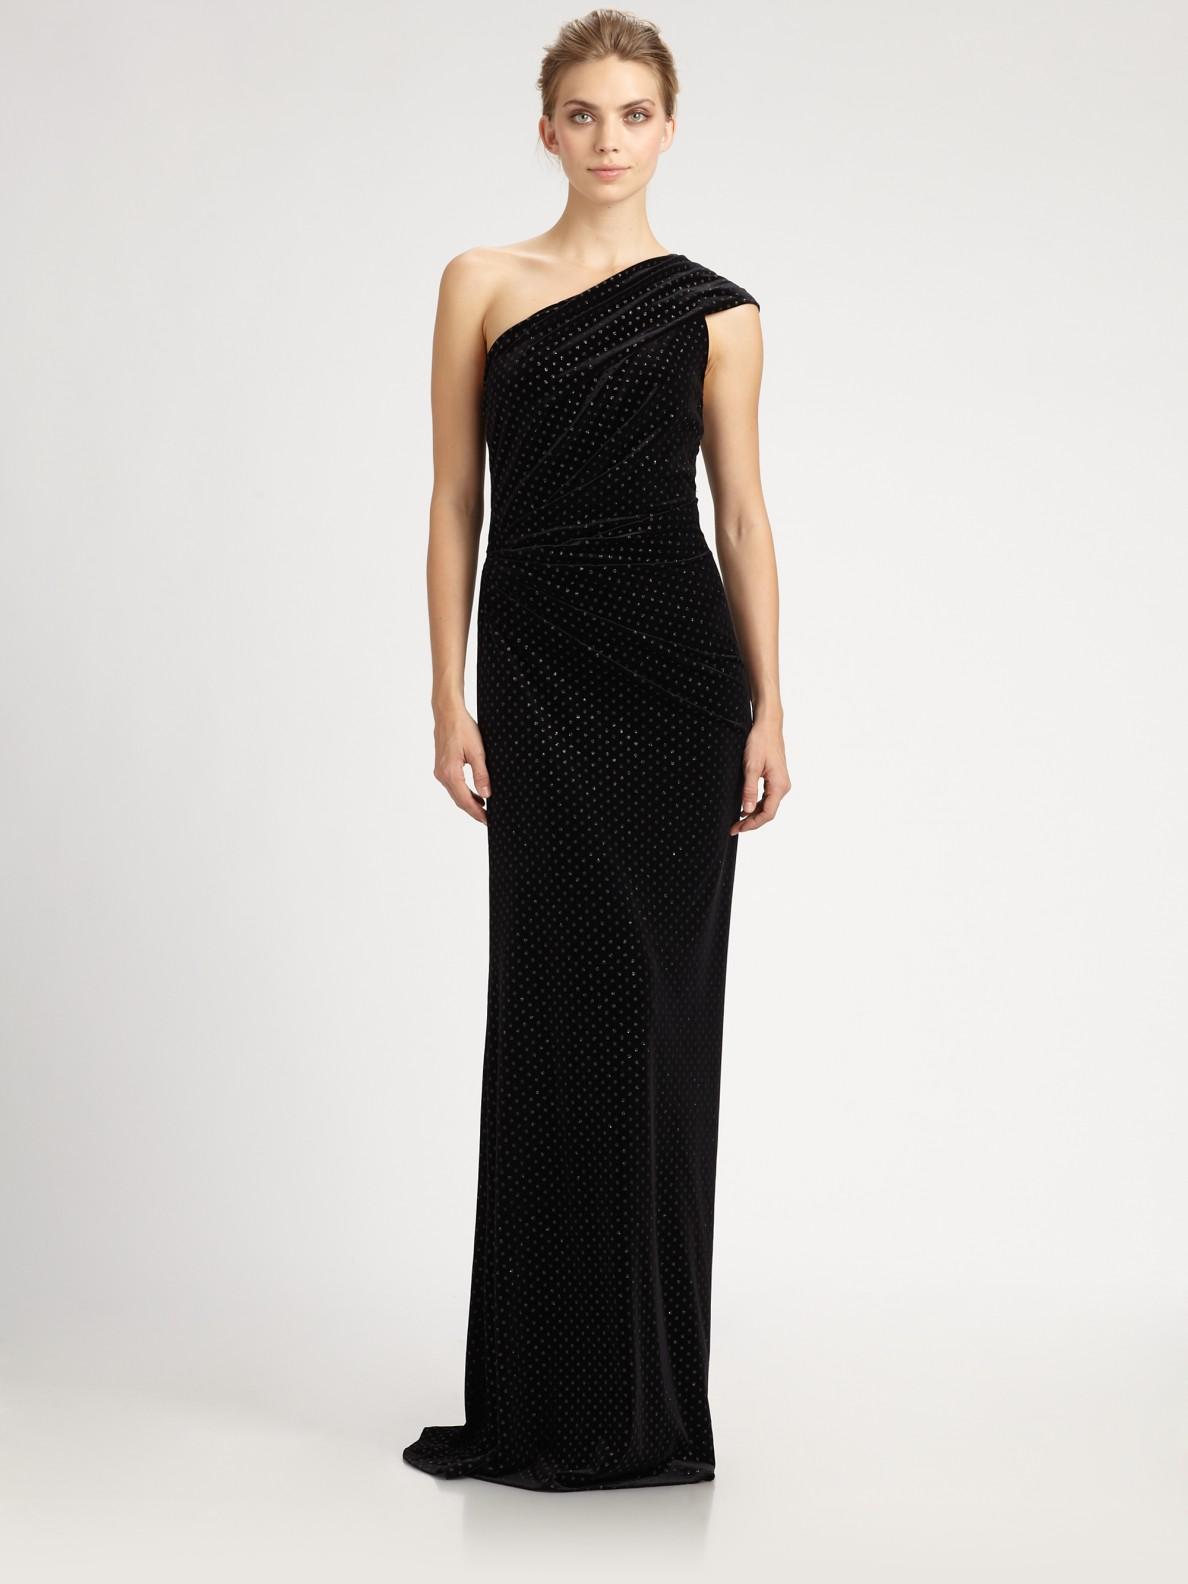 8de879992bec Lyst - David Meister One Shoulder Velvet Gown in Black